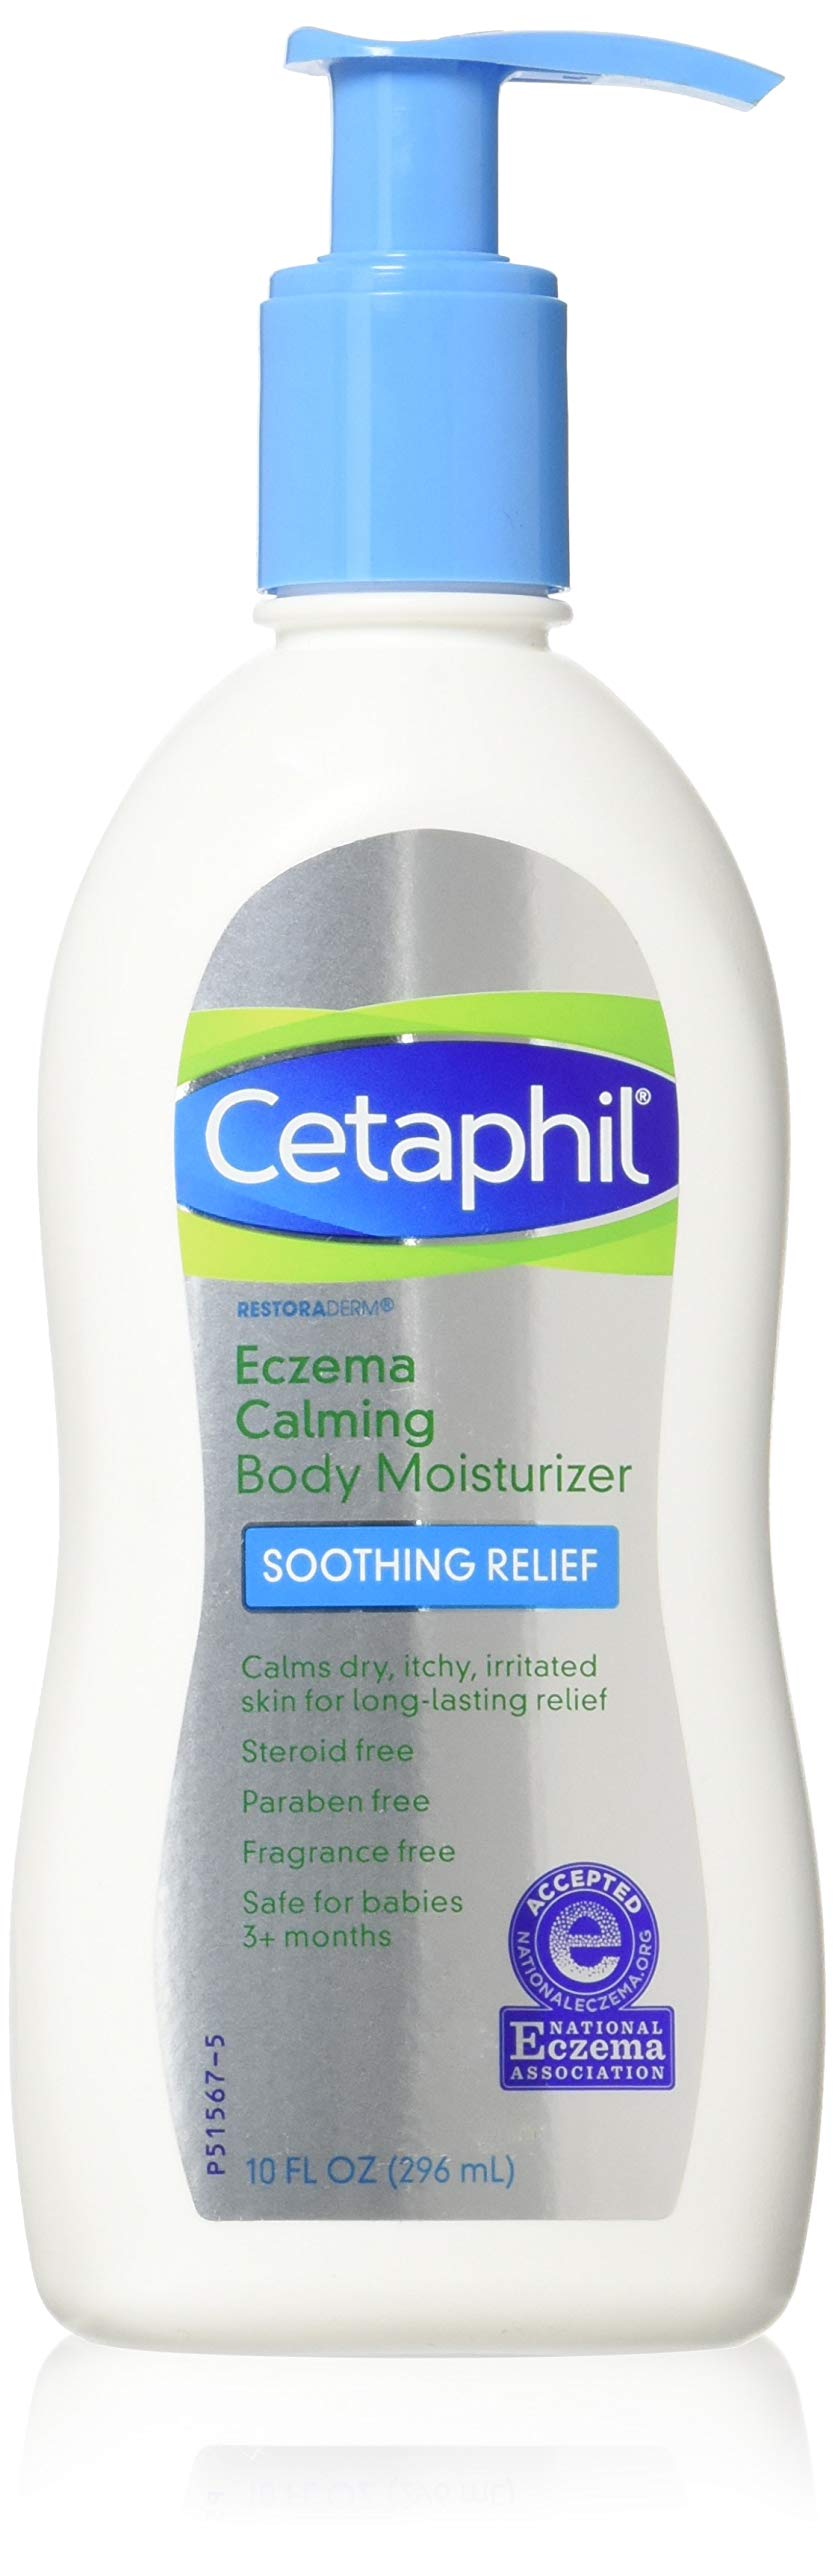 Cetaphil Restoraderm Gentle Body Moisturizer 10 Ounces (Pack of 3)